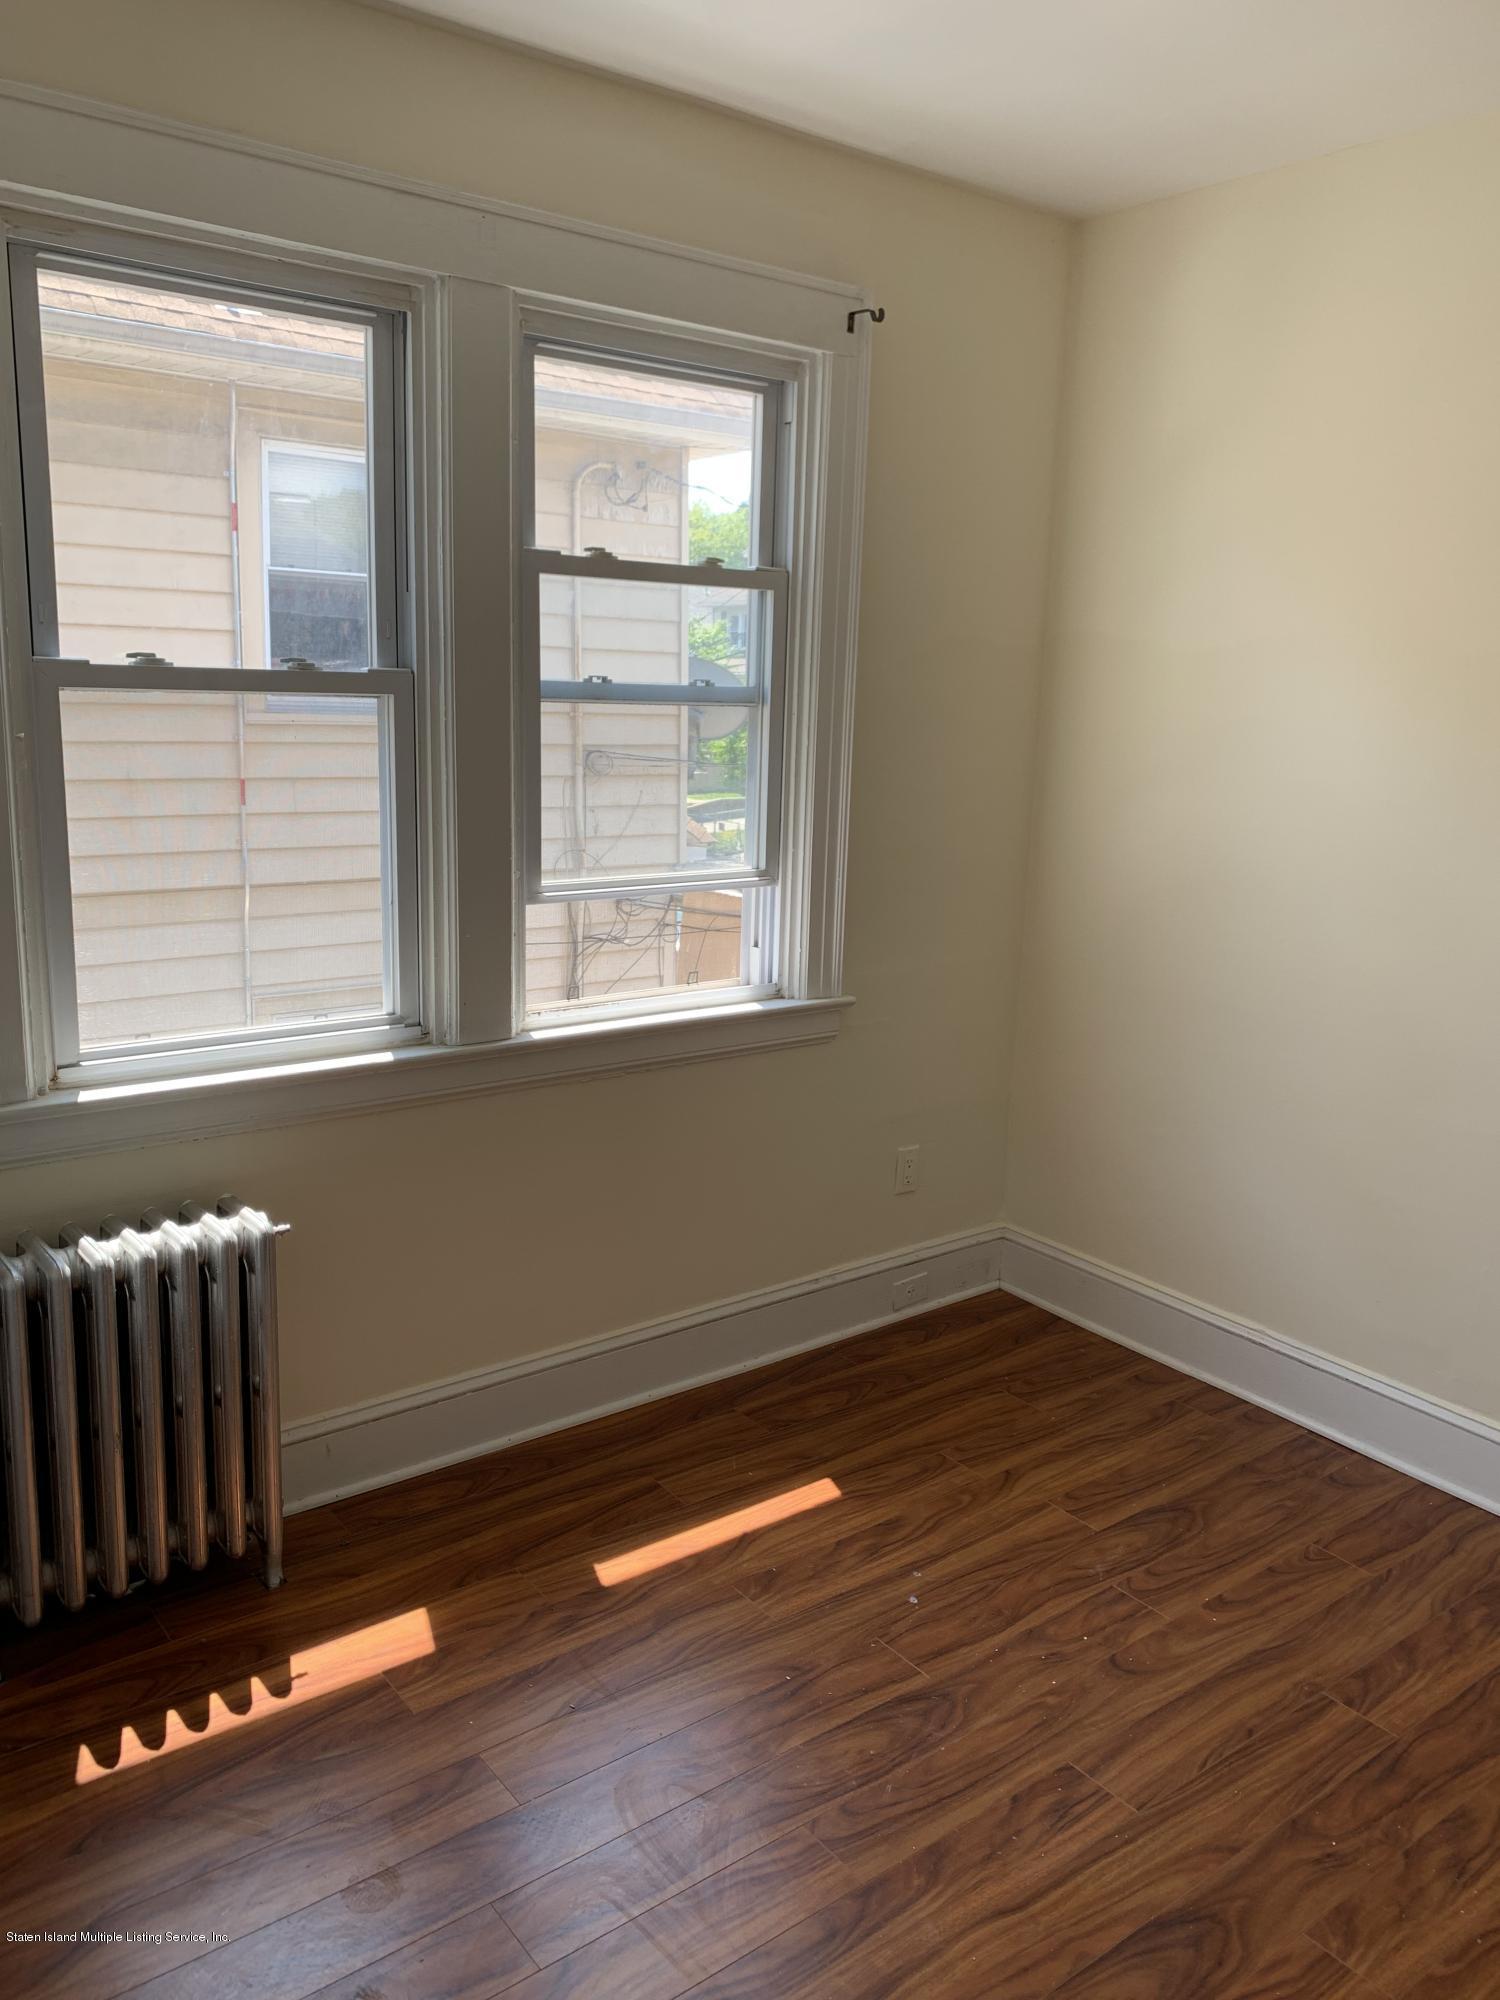 Single Family - Detached 253 Gordon Street  Staten Island, NY 10304, MLS-1131162-25